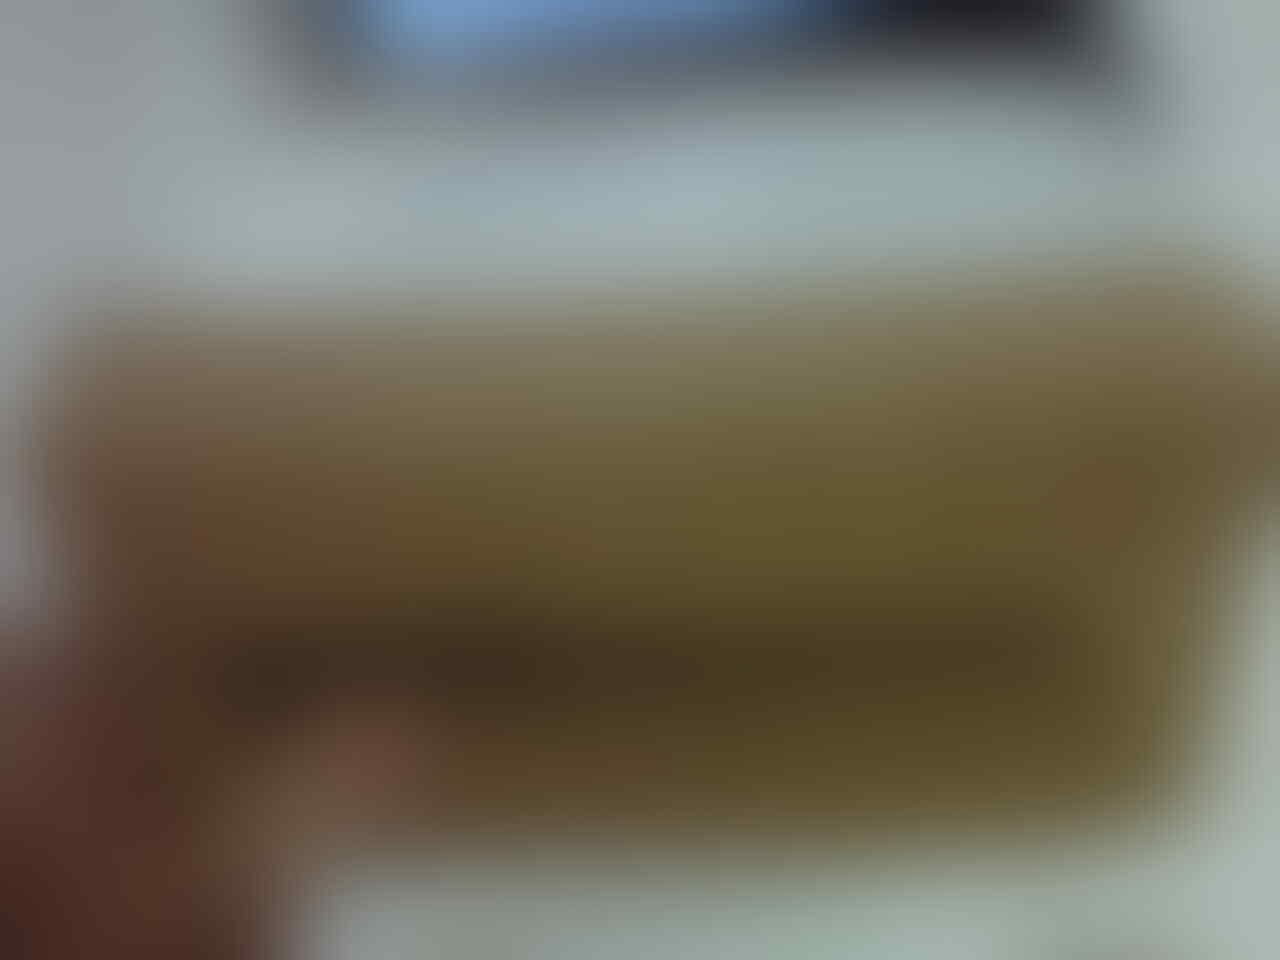 └┘┌┐ Jasa Order Online ( Ebay Amazon Aliexpress, dll ) Fee cuma Rp 10.000,- ┌┐└┘